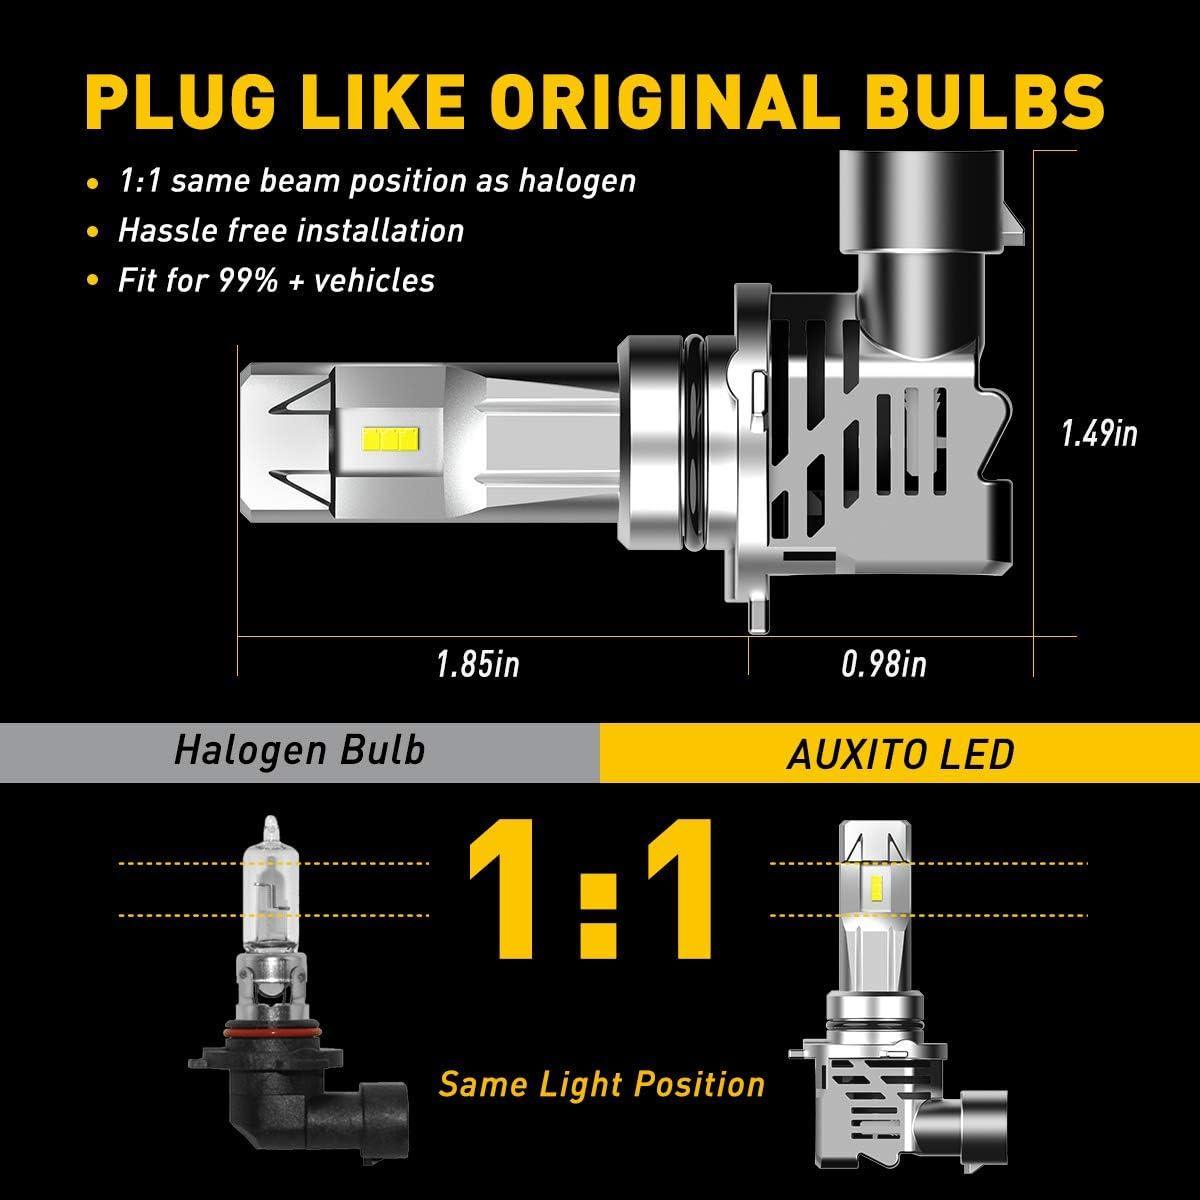 Pack of 2 AUXITO 9006 LED Headlight Bulbs 12000LM Per Set 6500K Xenon White Mini Size HB4 Wireless Headlight